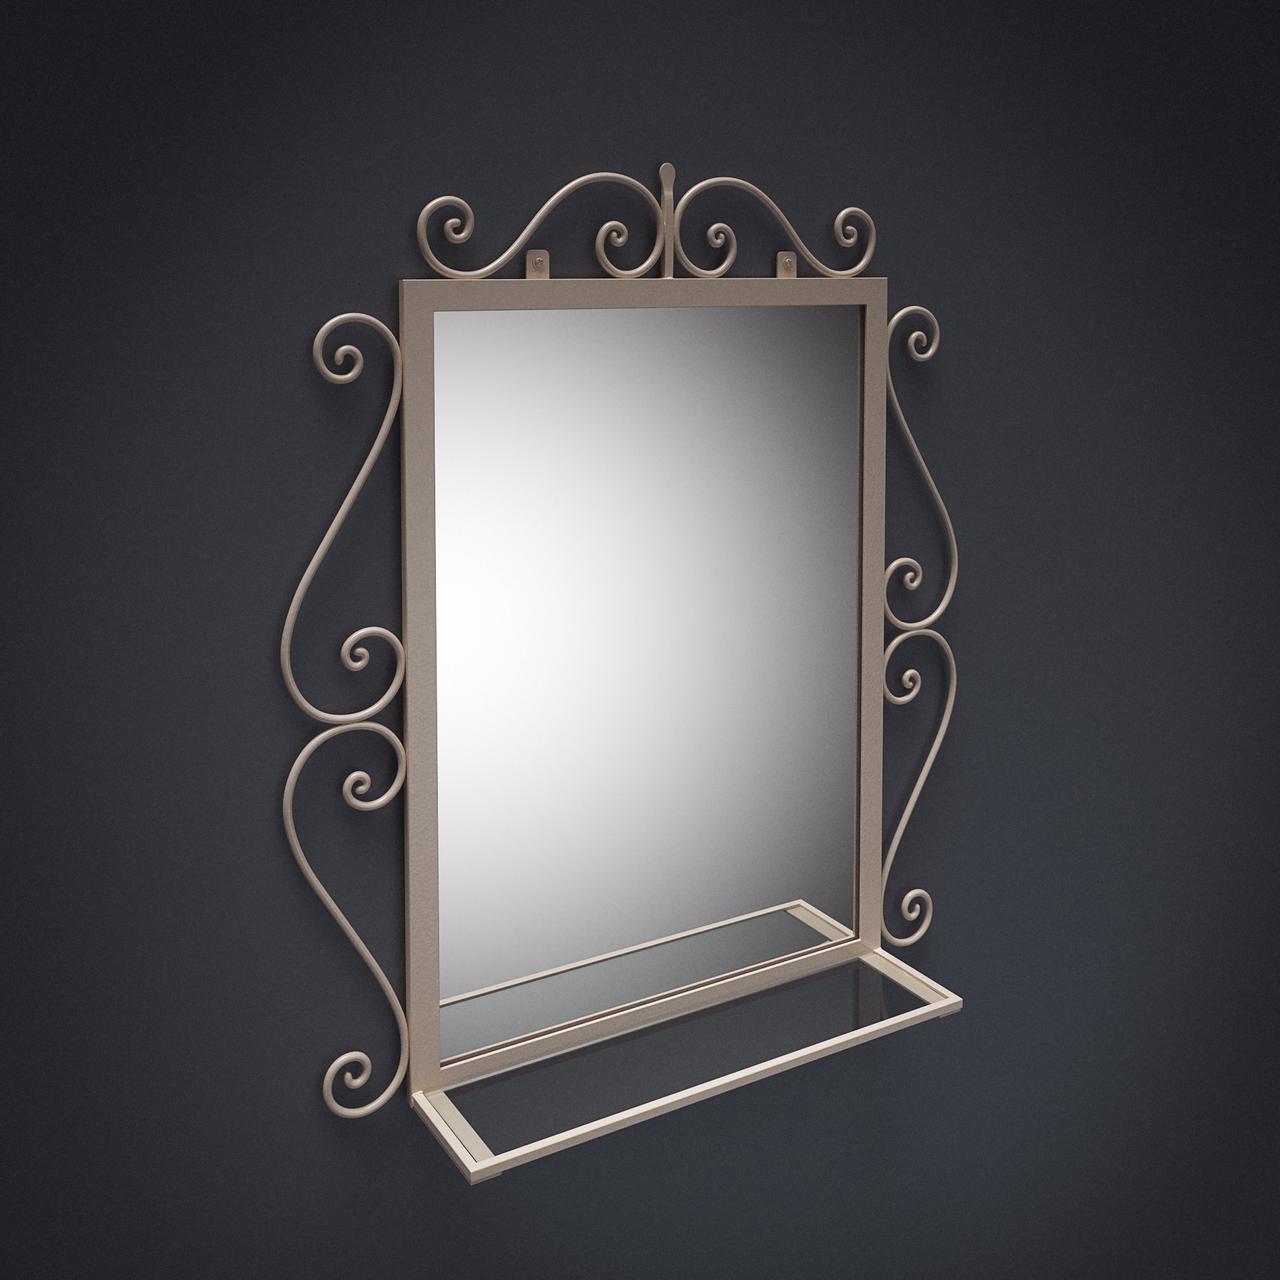 Коване дзеркало Амбер